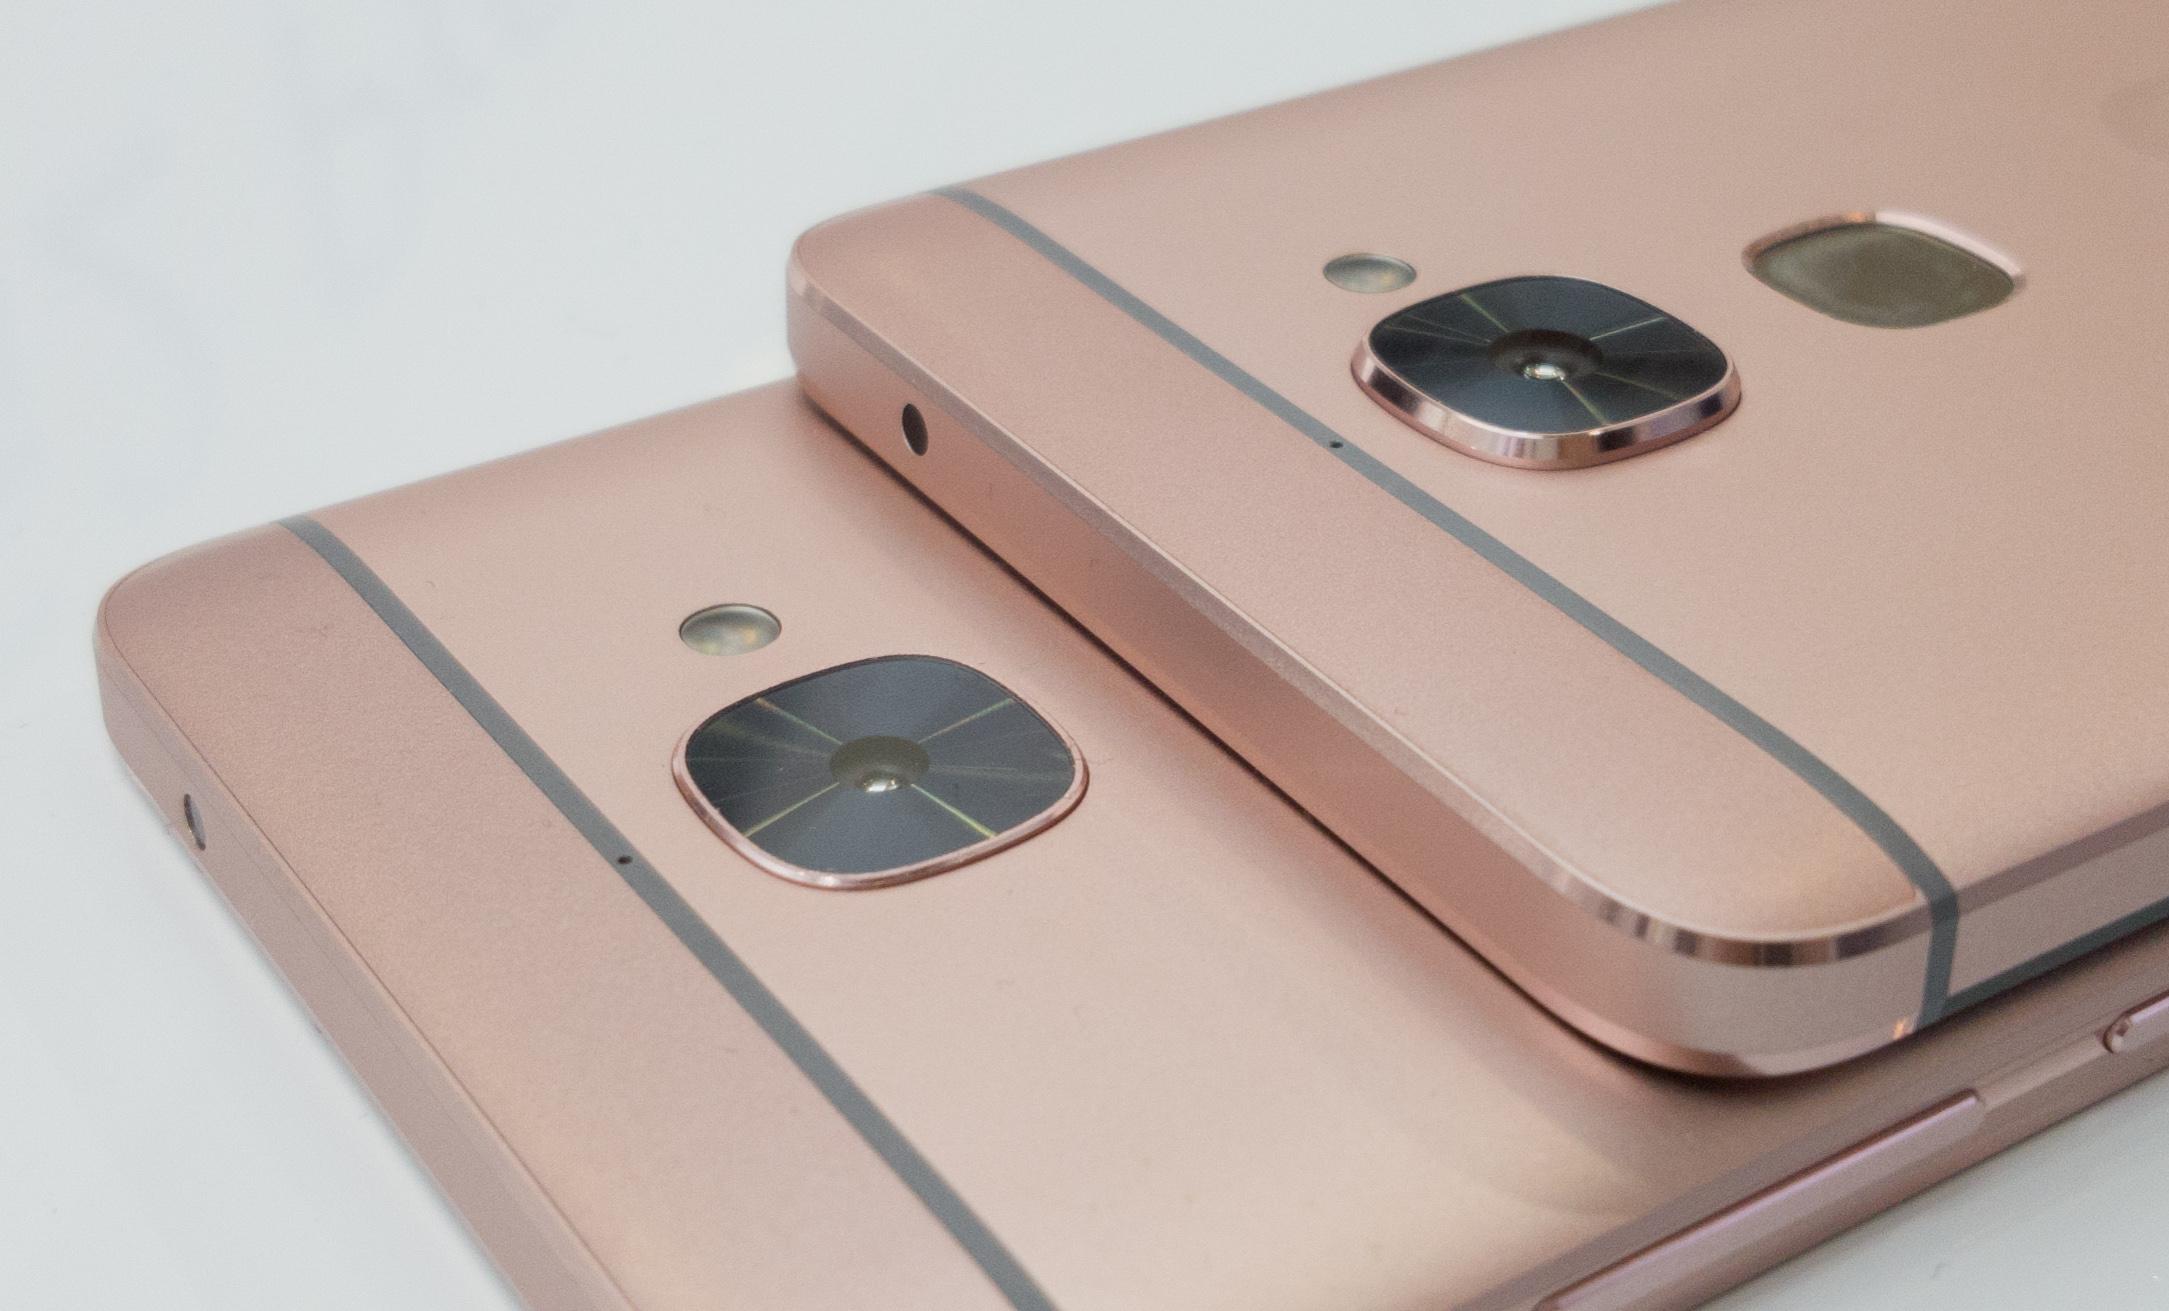 LeEco Announces New Le 2, Le 2 Pro, and LeMax 2